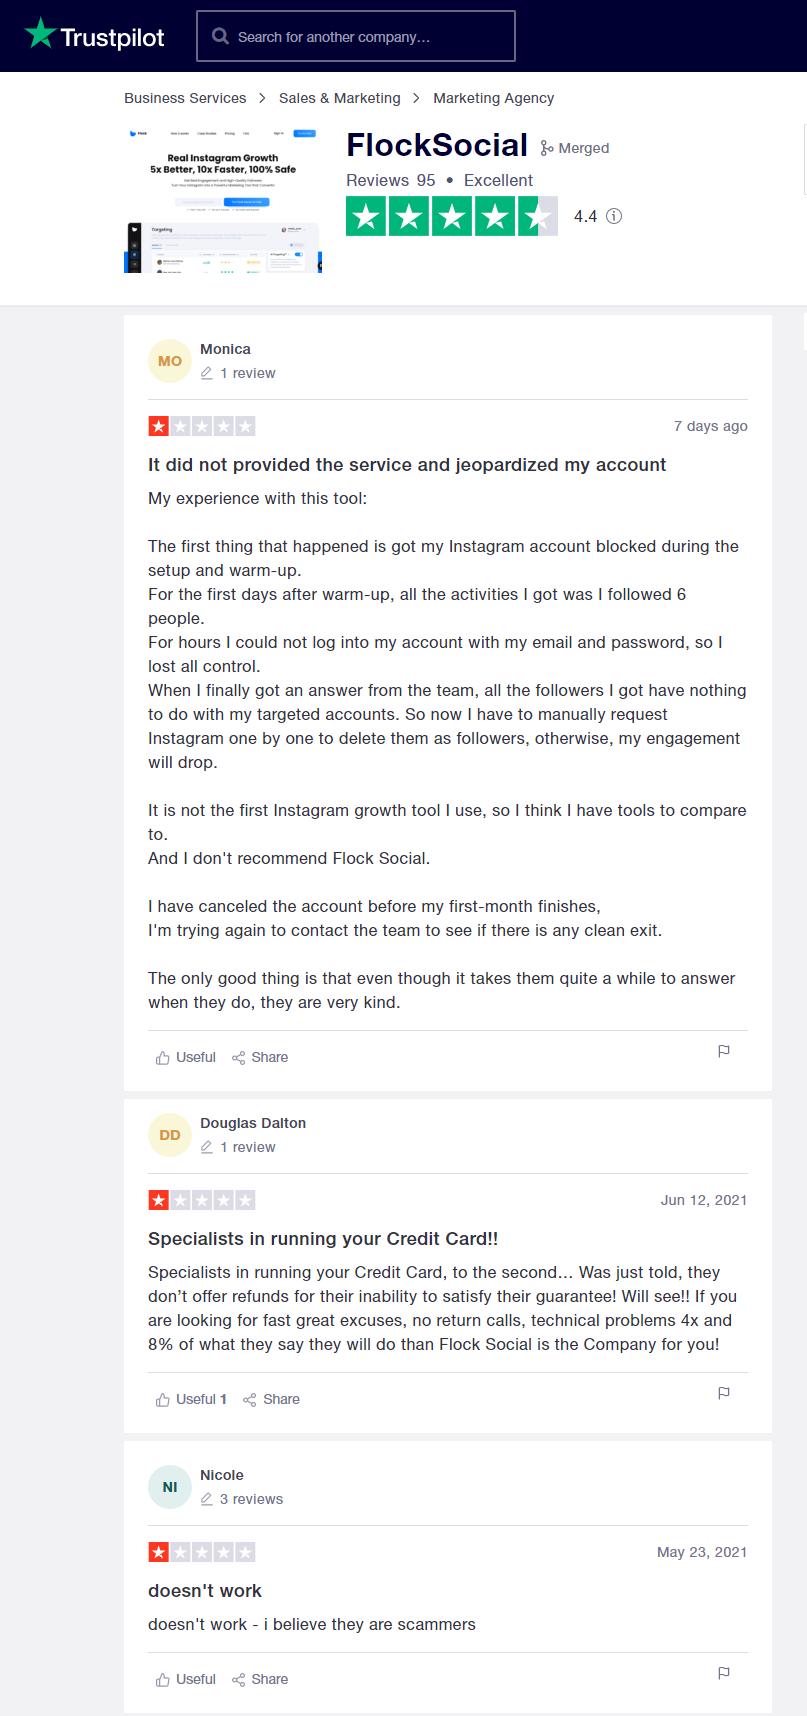 Flock Social Trustpilot Reviews